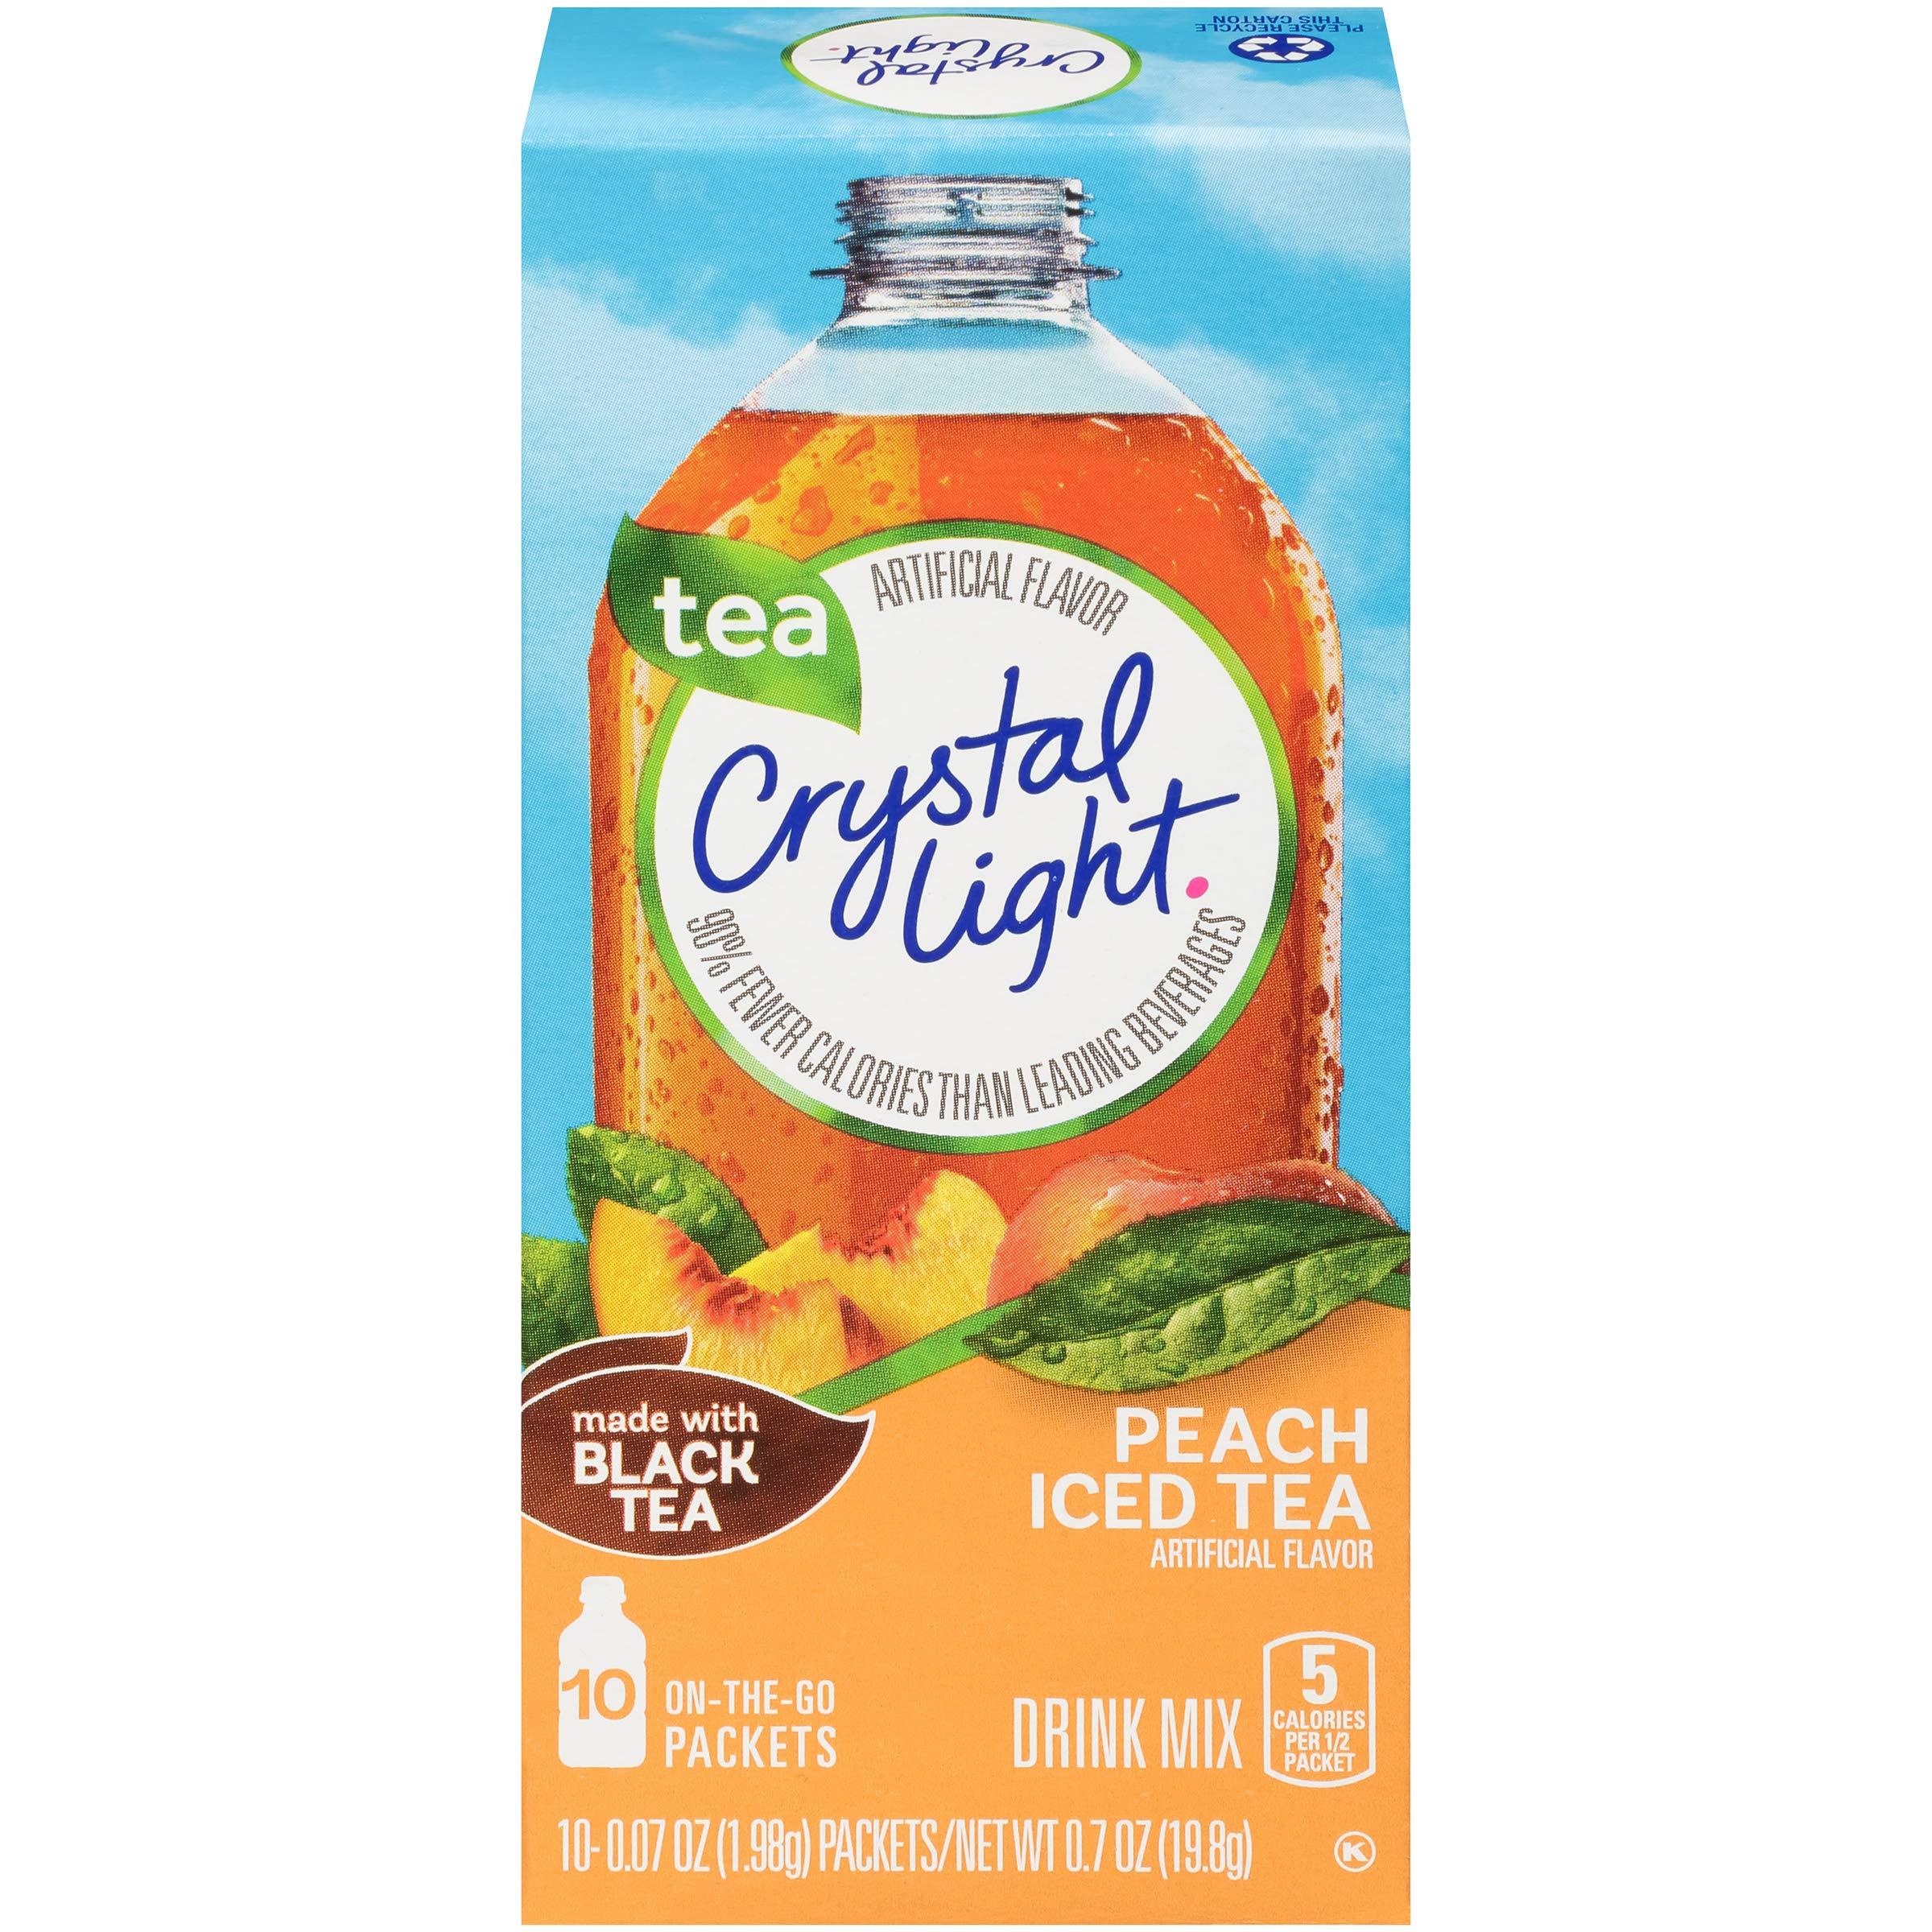 Crystal Light On The Go Peach Iced Tea, 10-Packet Box (Pack of 10)